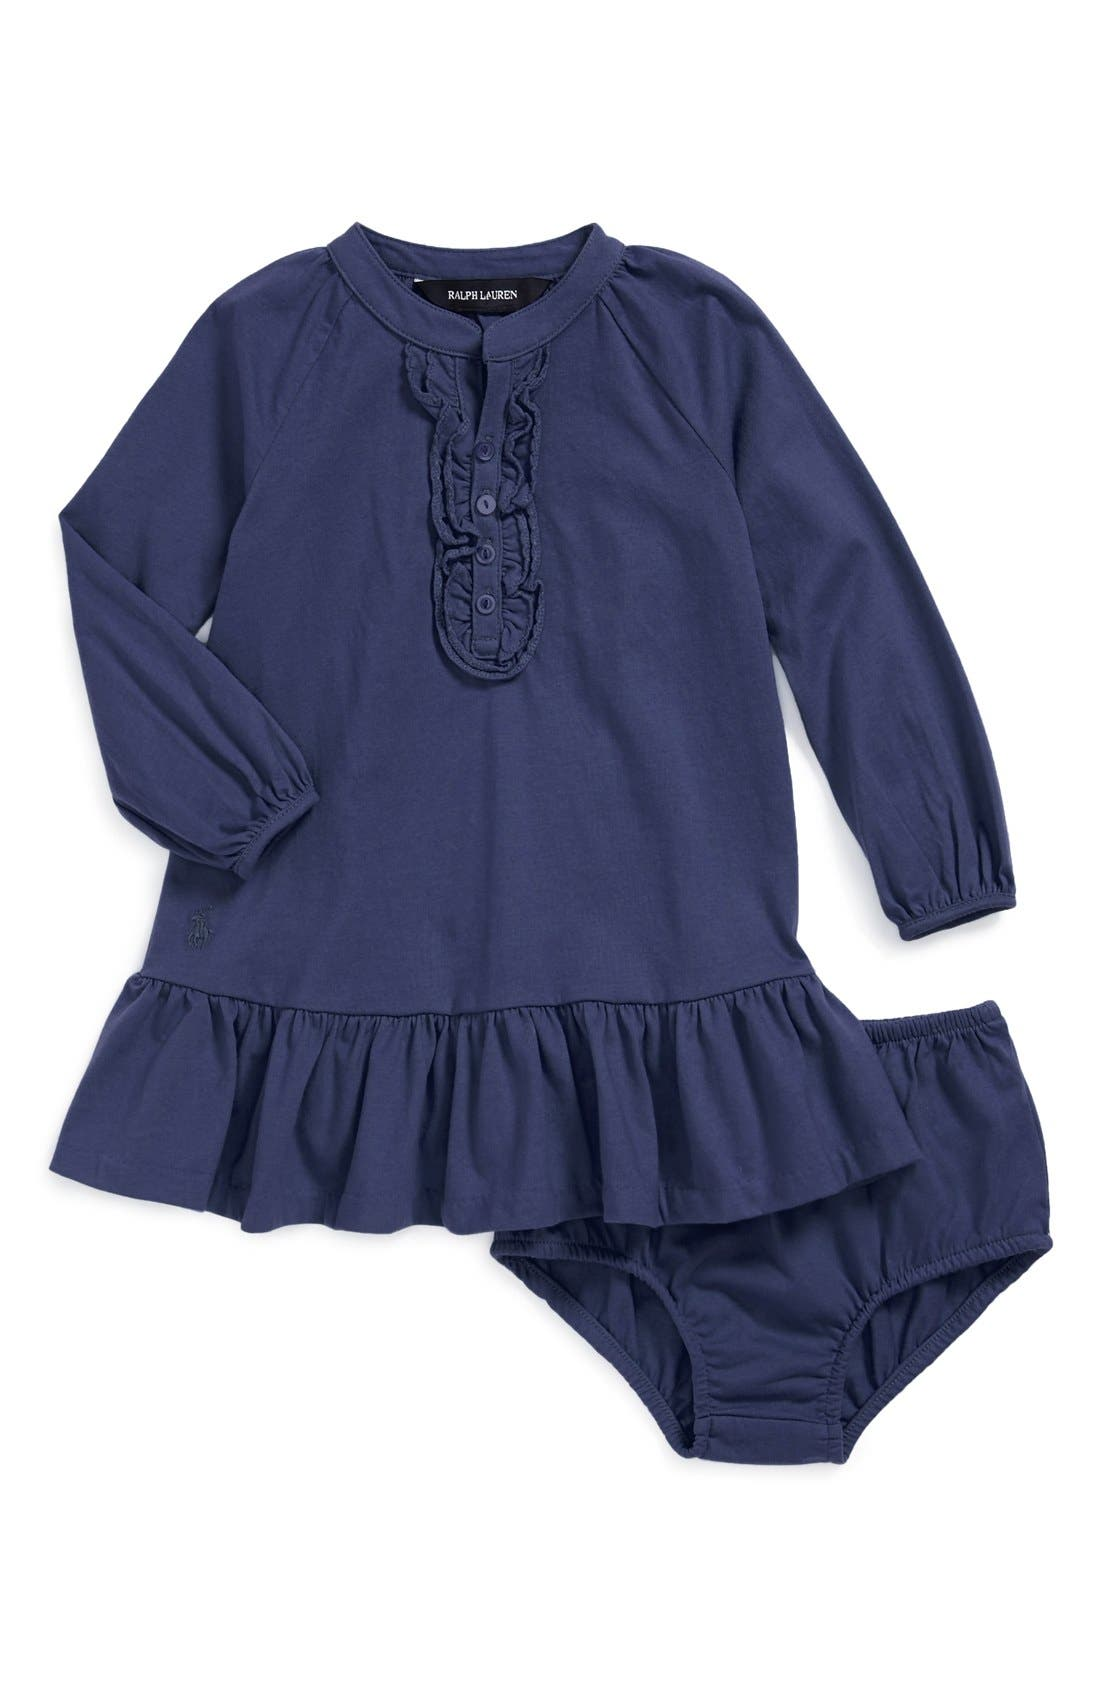 Alternate Image 1 Selected - Ralph Lauren Dress & Bloomers (Baby Girls)